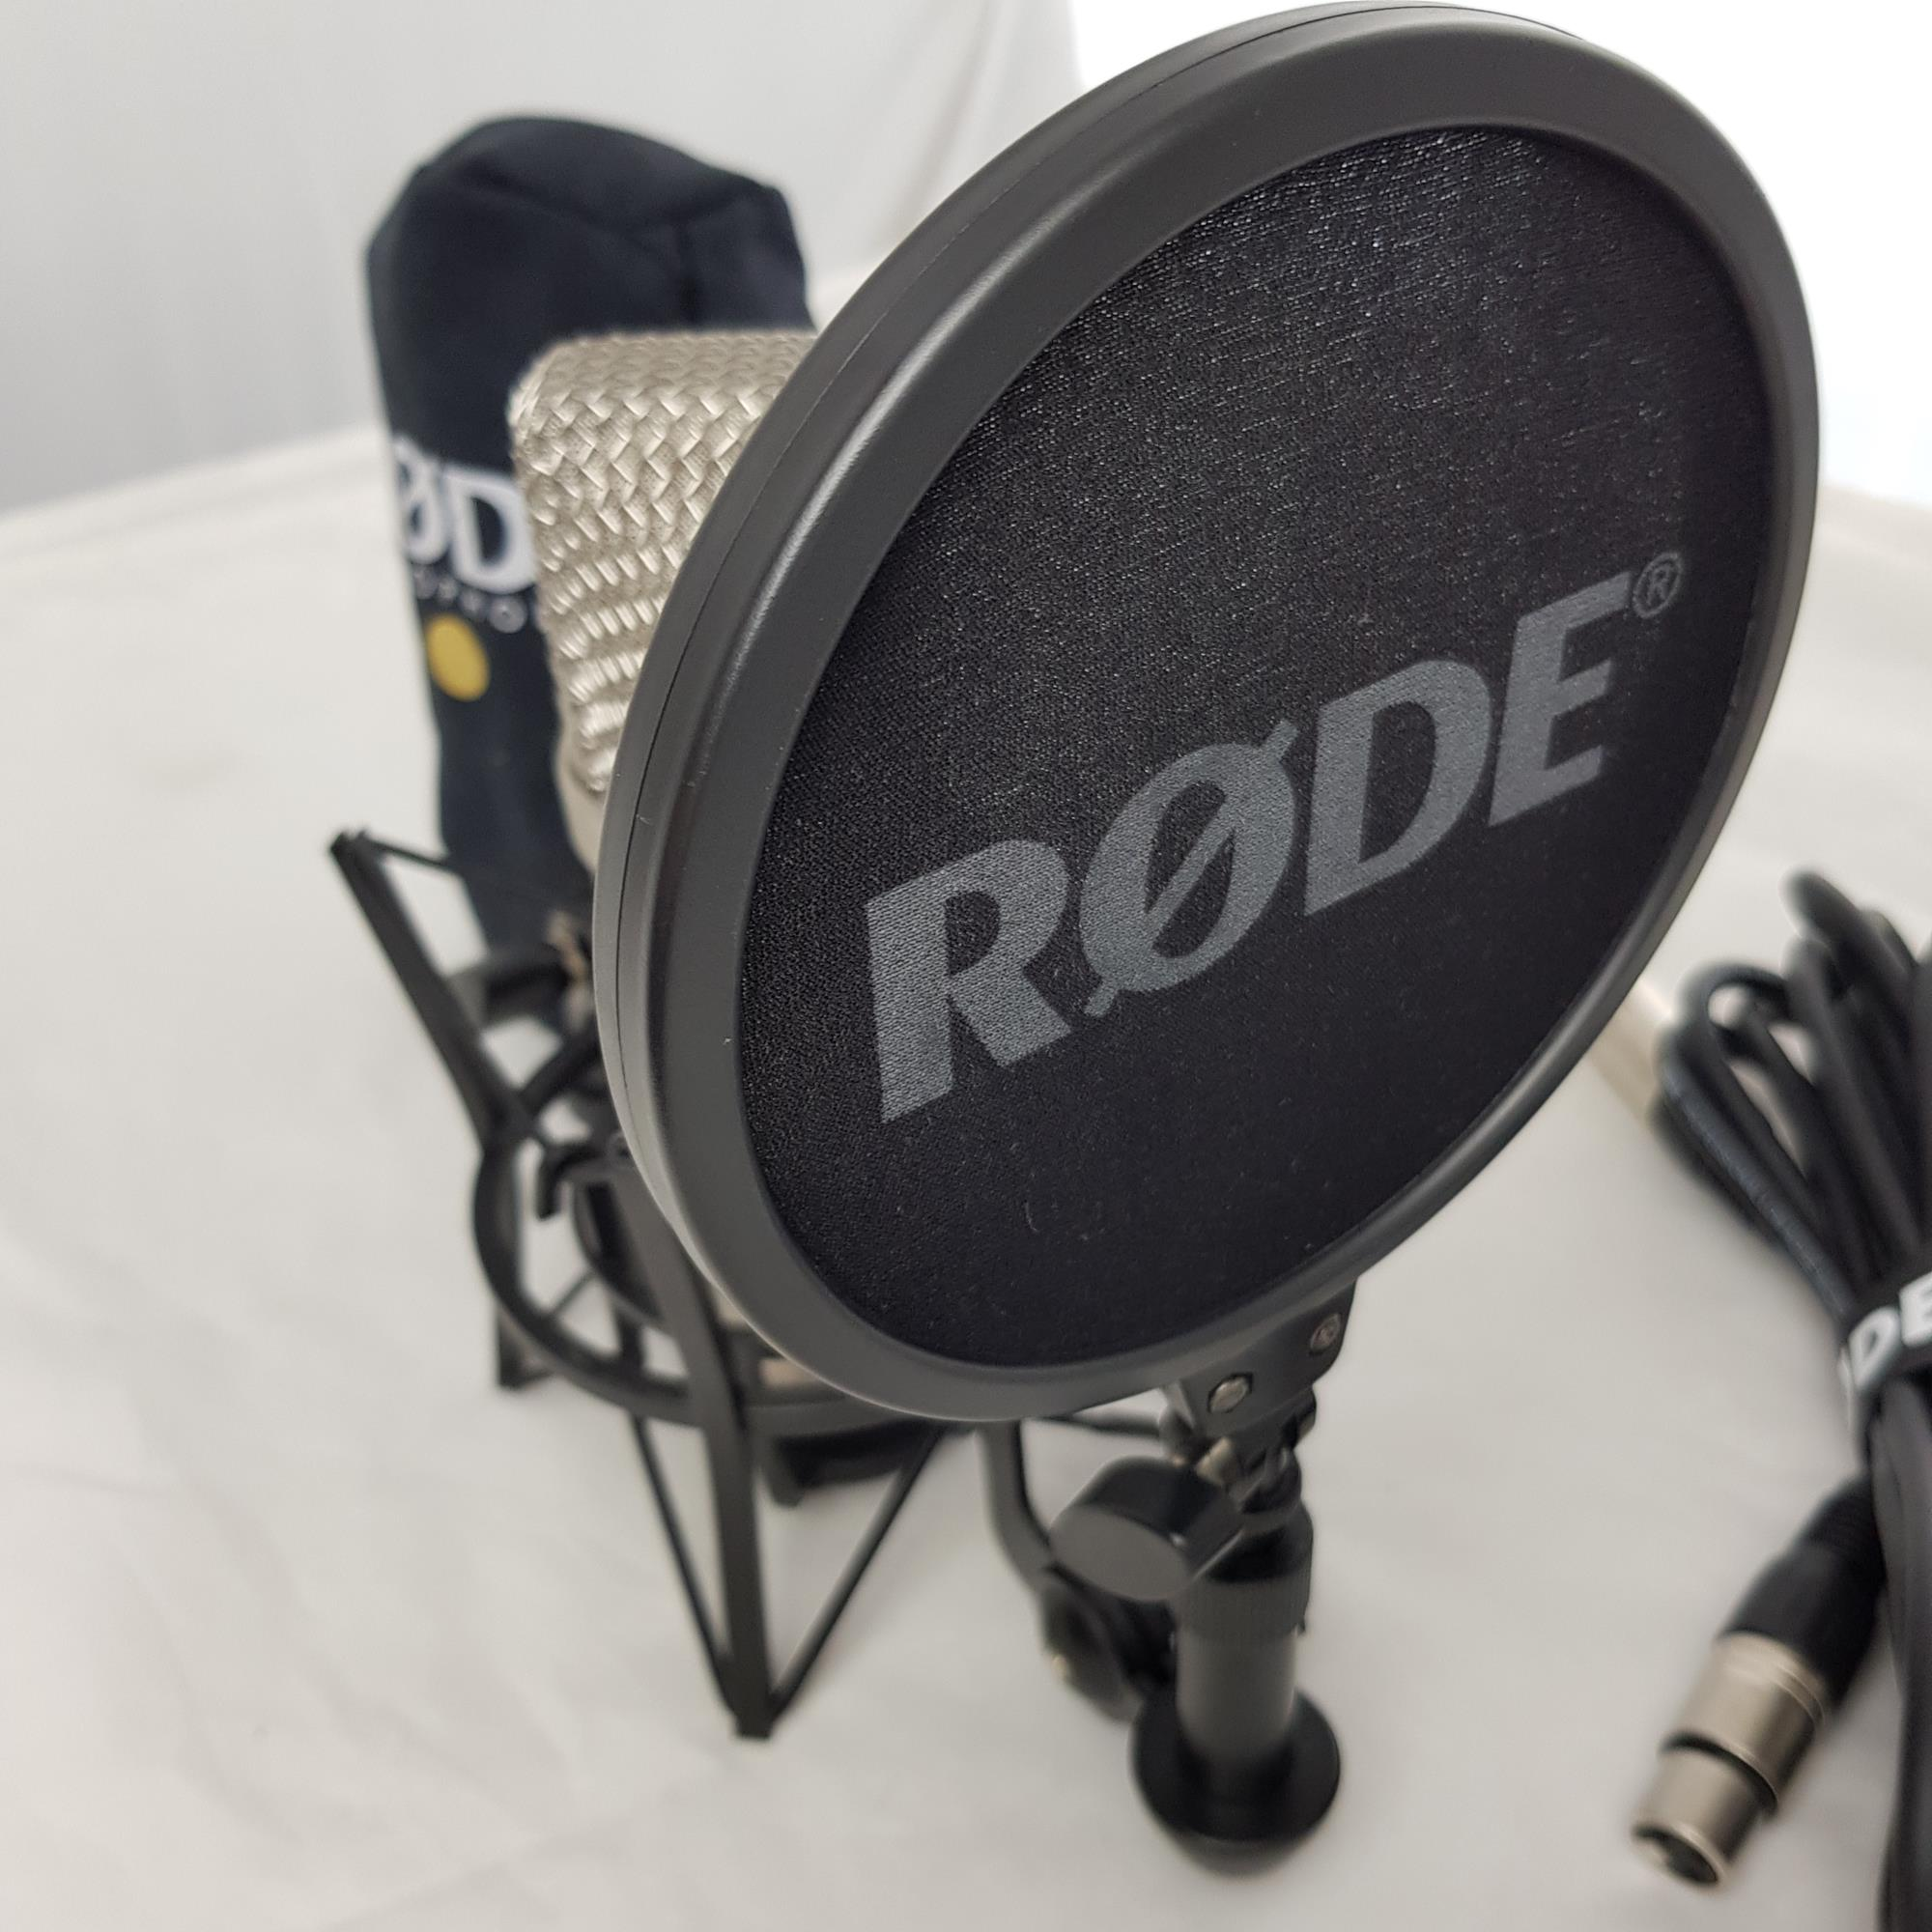 RODE-NT1-A-CONDENSER-MIC-MIC-HOLDER-sku-1625325663050